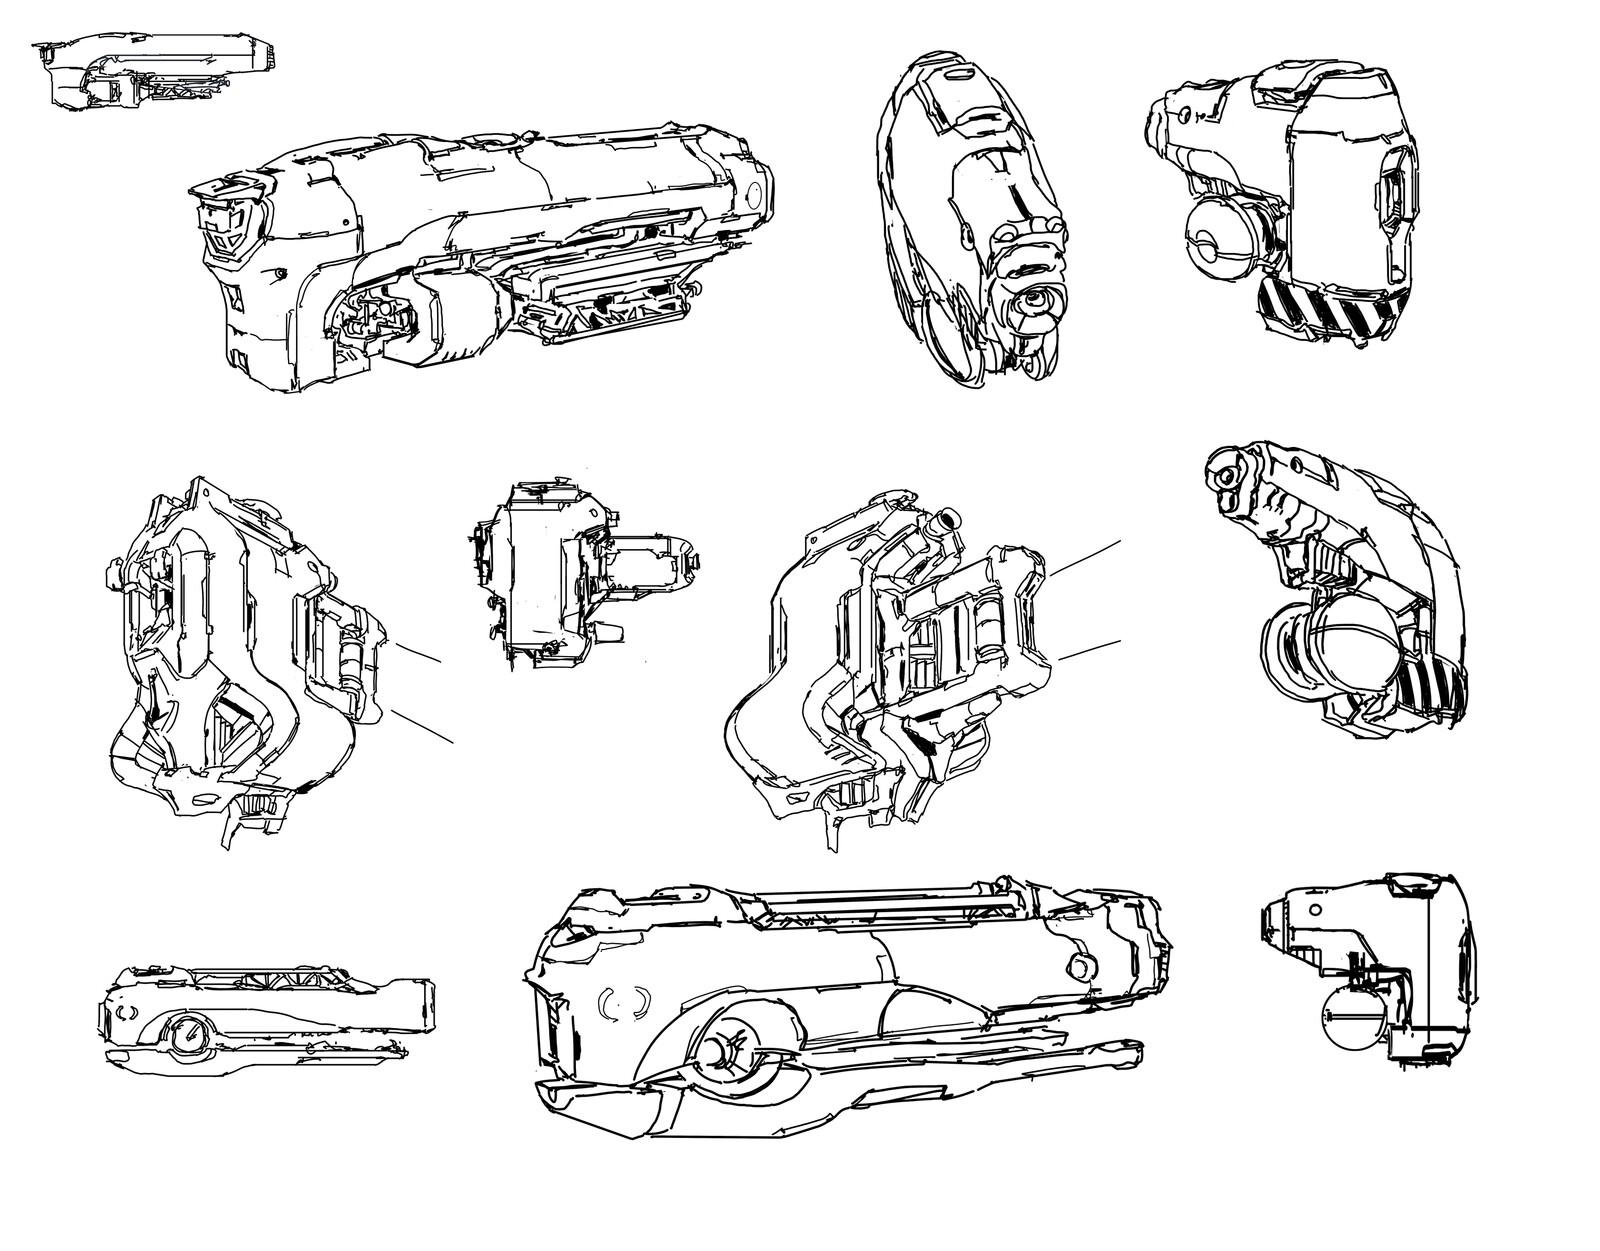 random ship doodle 6